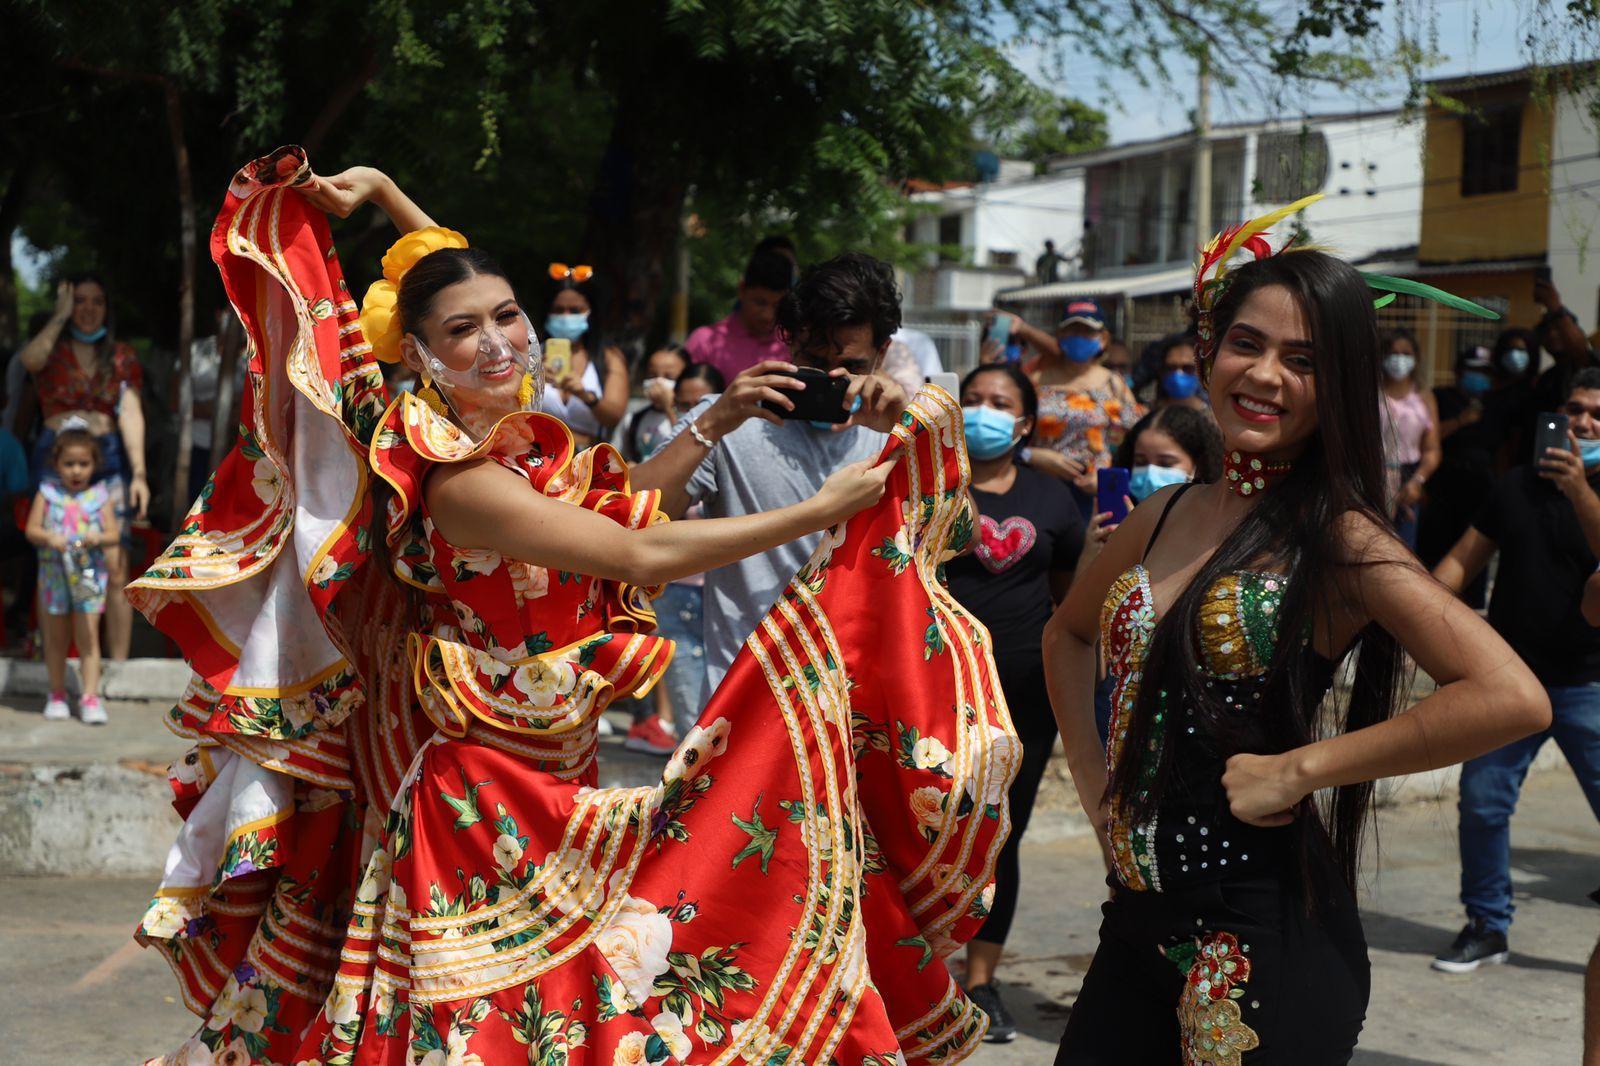 Se mueve el Carnaval, Valeria Charris visitó el barrio Santa Helena